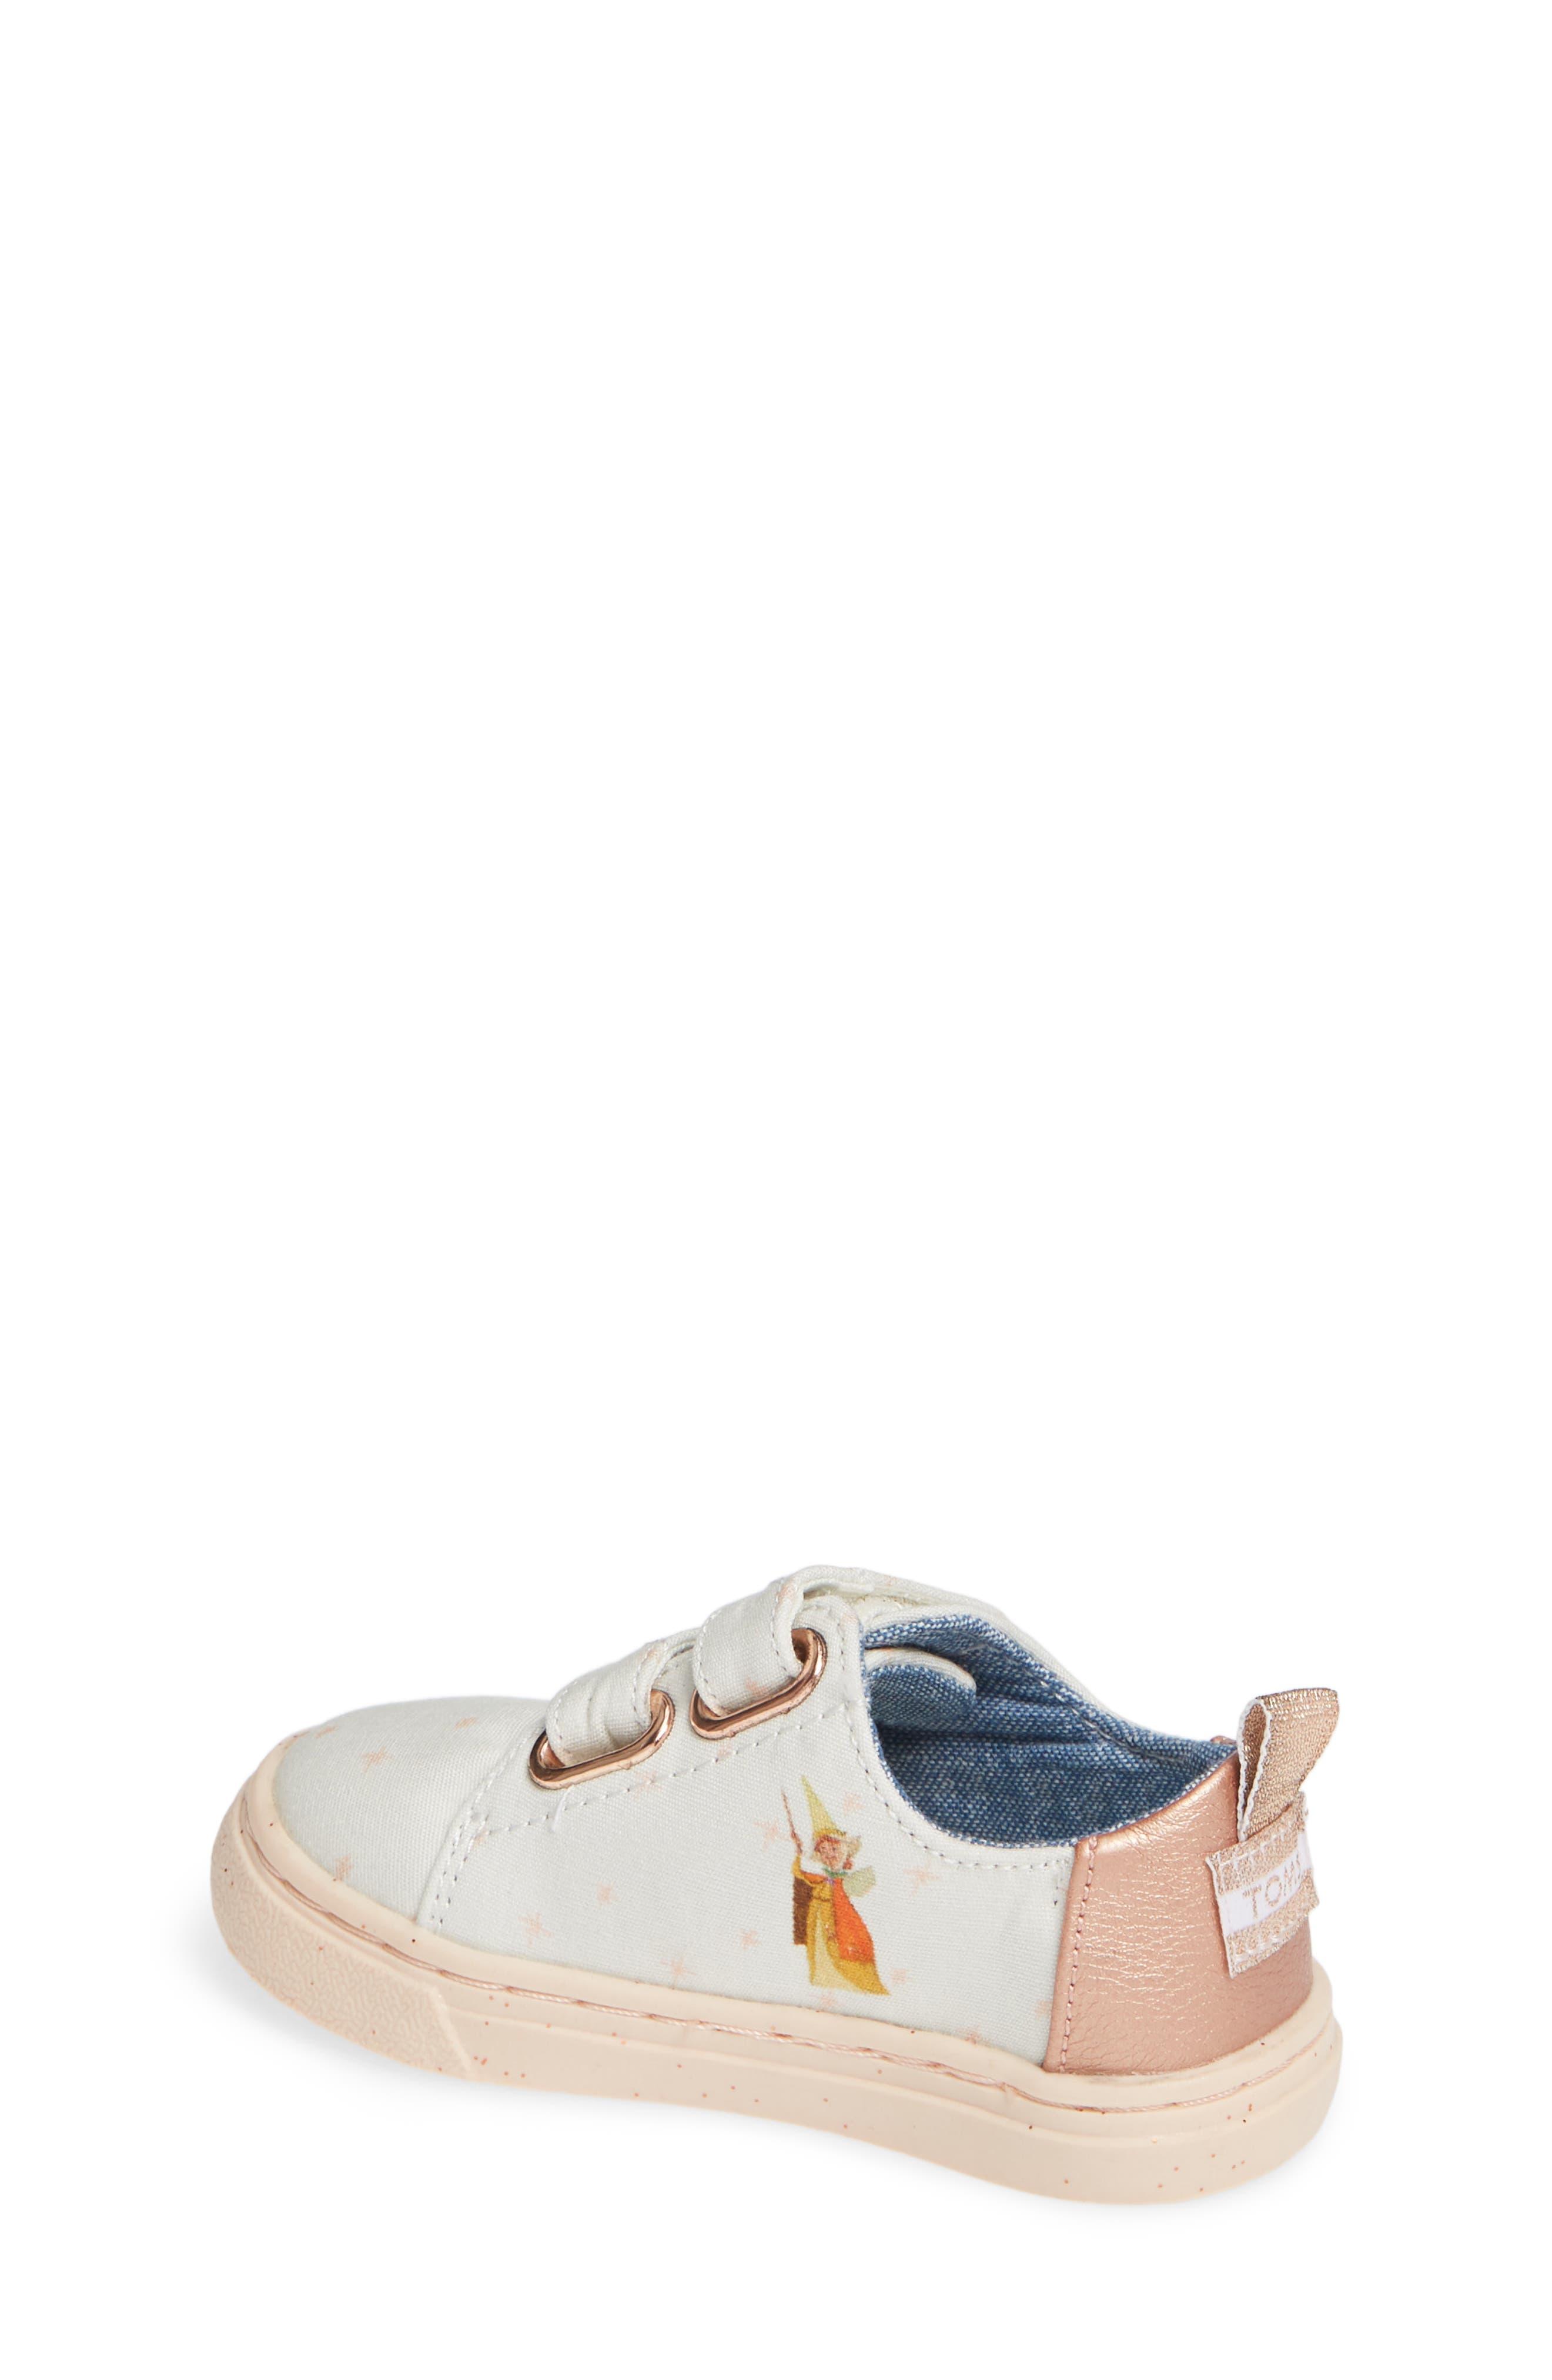 x Disney Tiny Lenny Sneaker,                             Alternate thumbnail 2, color,                             900